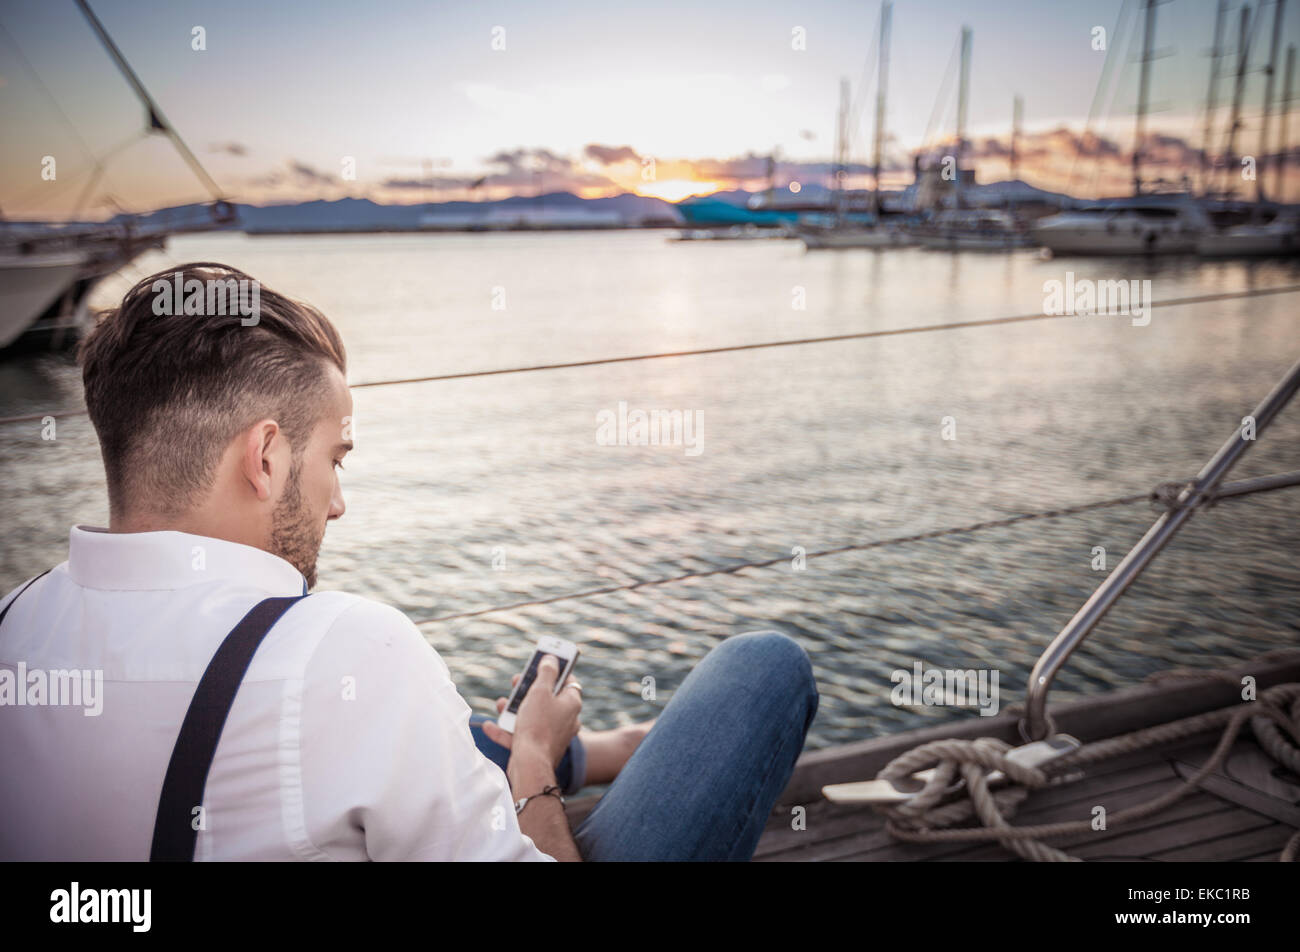 Young man using smartphone on yacht, Cagliari, Sardinia, Italy - Stock Image